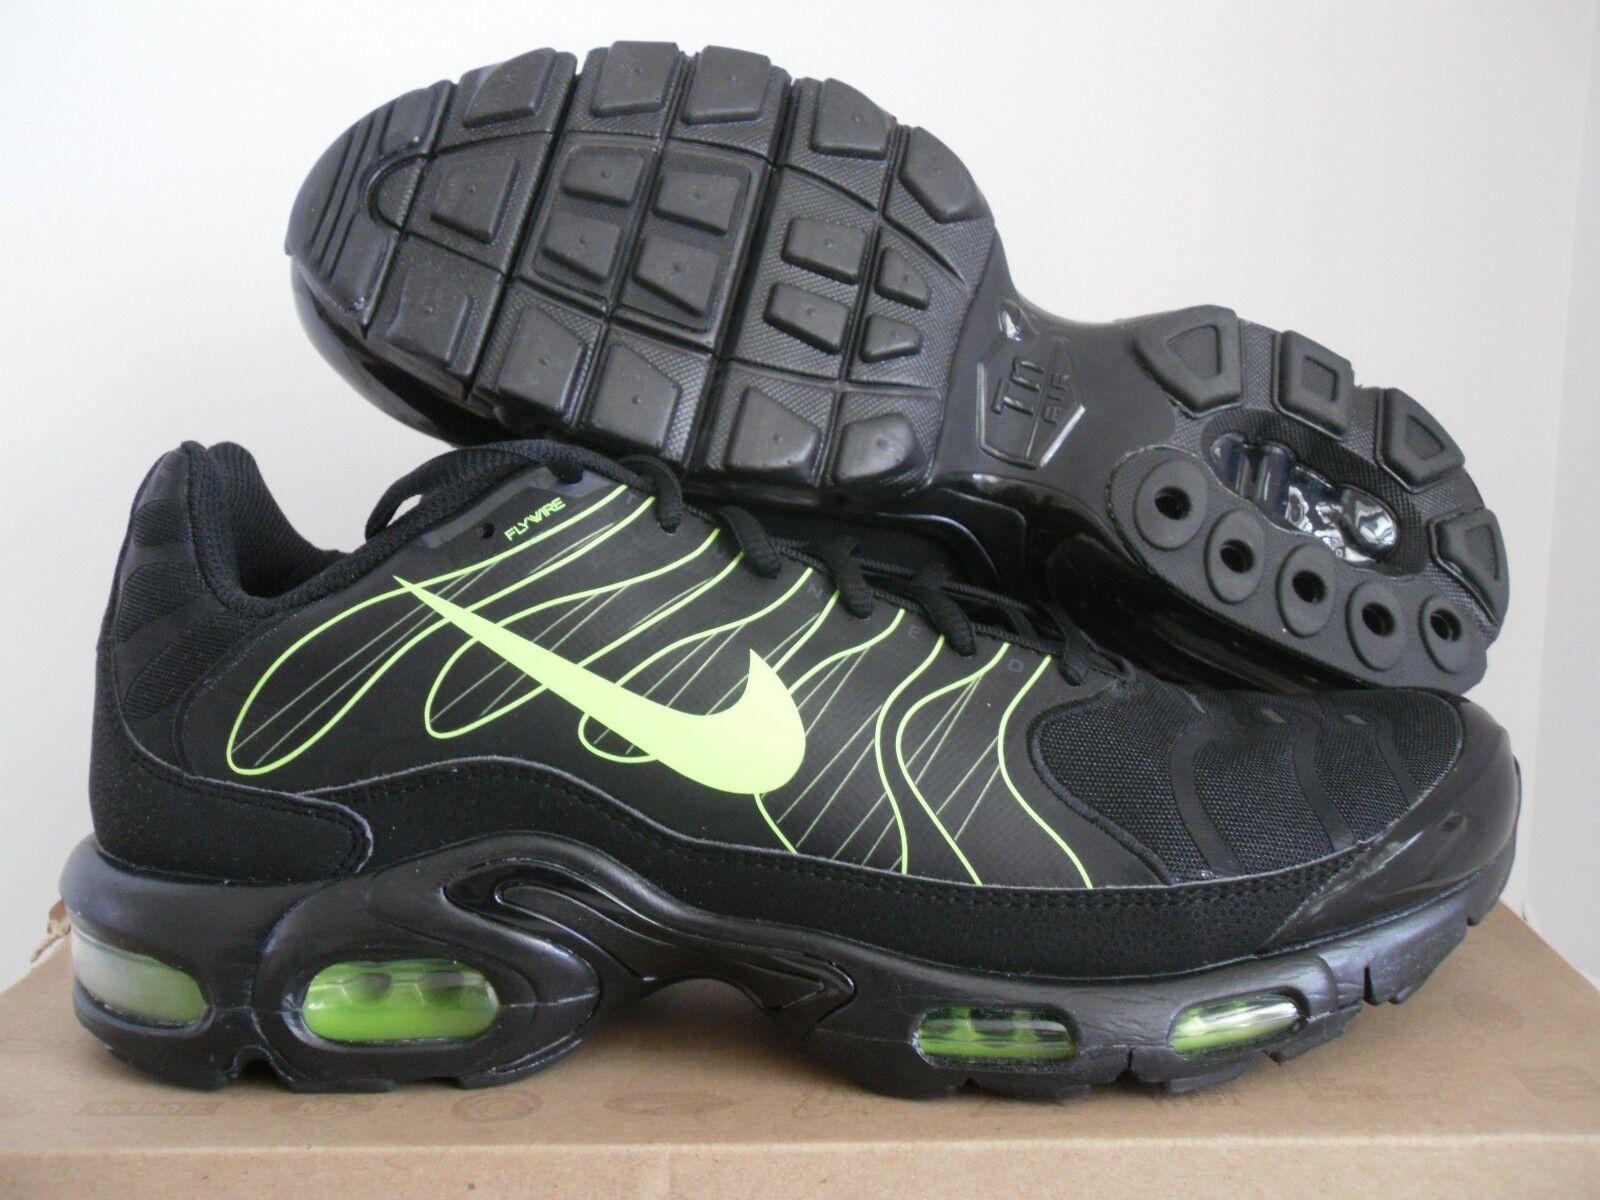 Nike air max + 1,5 [426882-030] nero-volt sz 13 [426882-030] 1,5 6dd37c